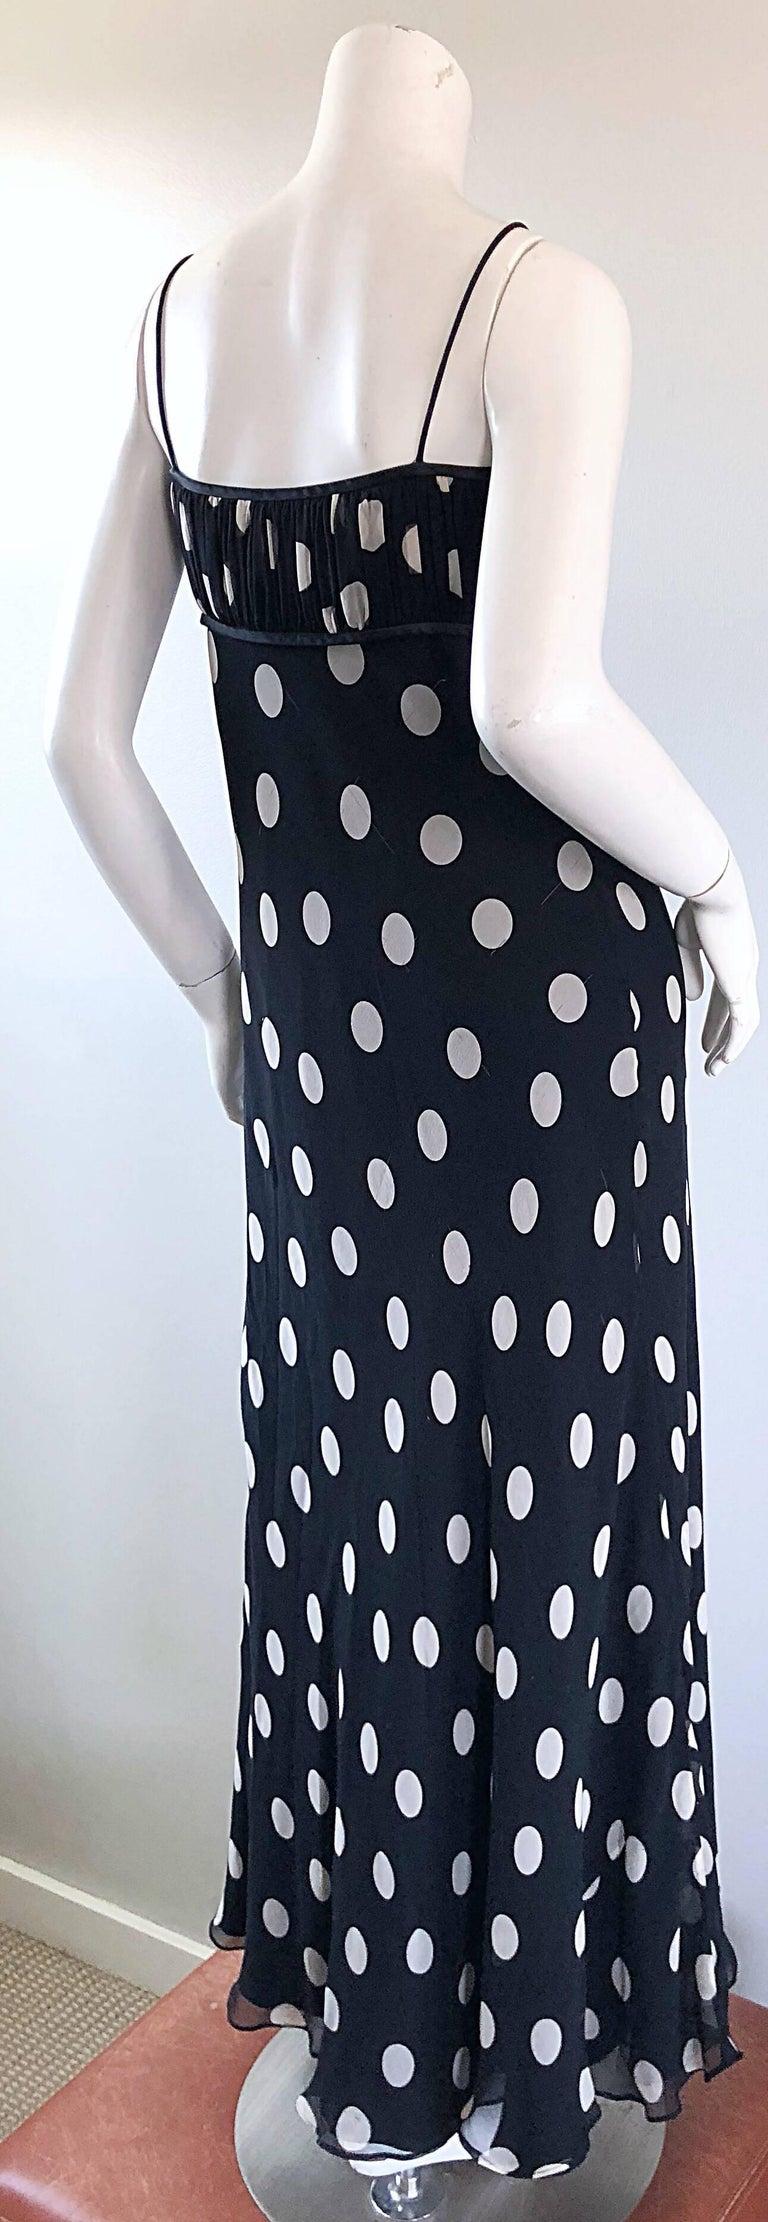 1990s Abriele Melano Black and White Polka Dot Silk Chiffon Maxi Dress 90s Gown For Sale 7